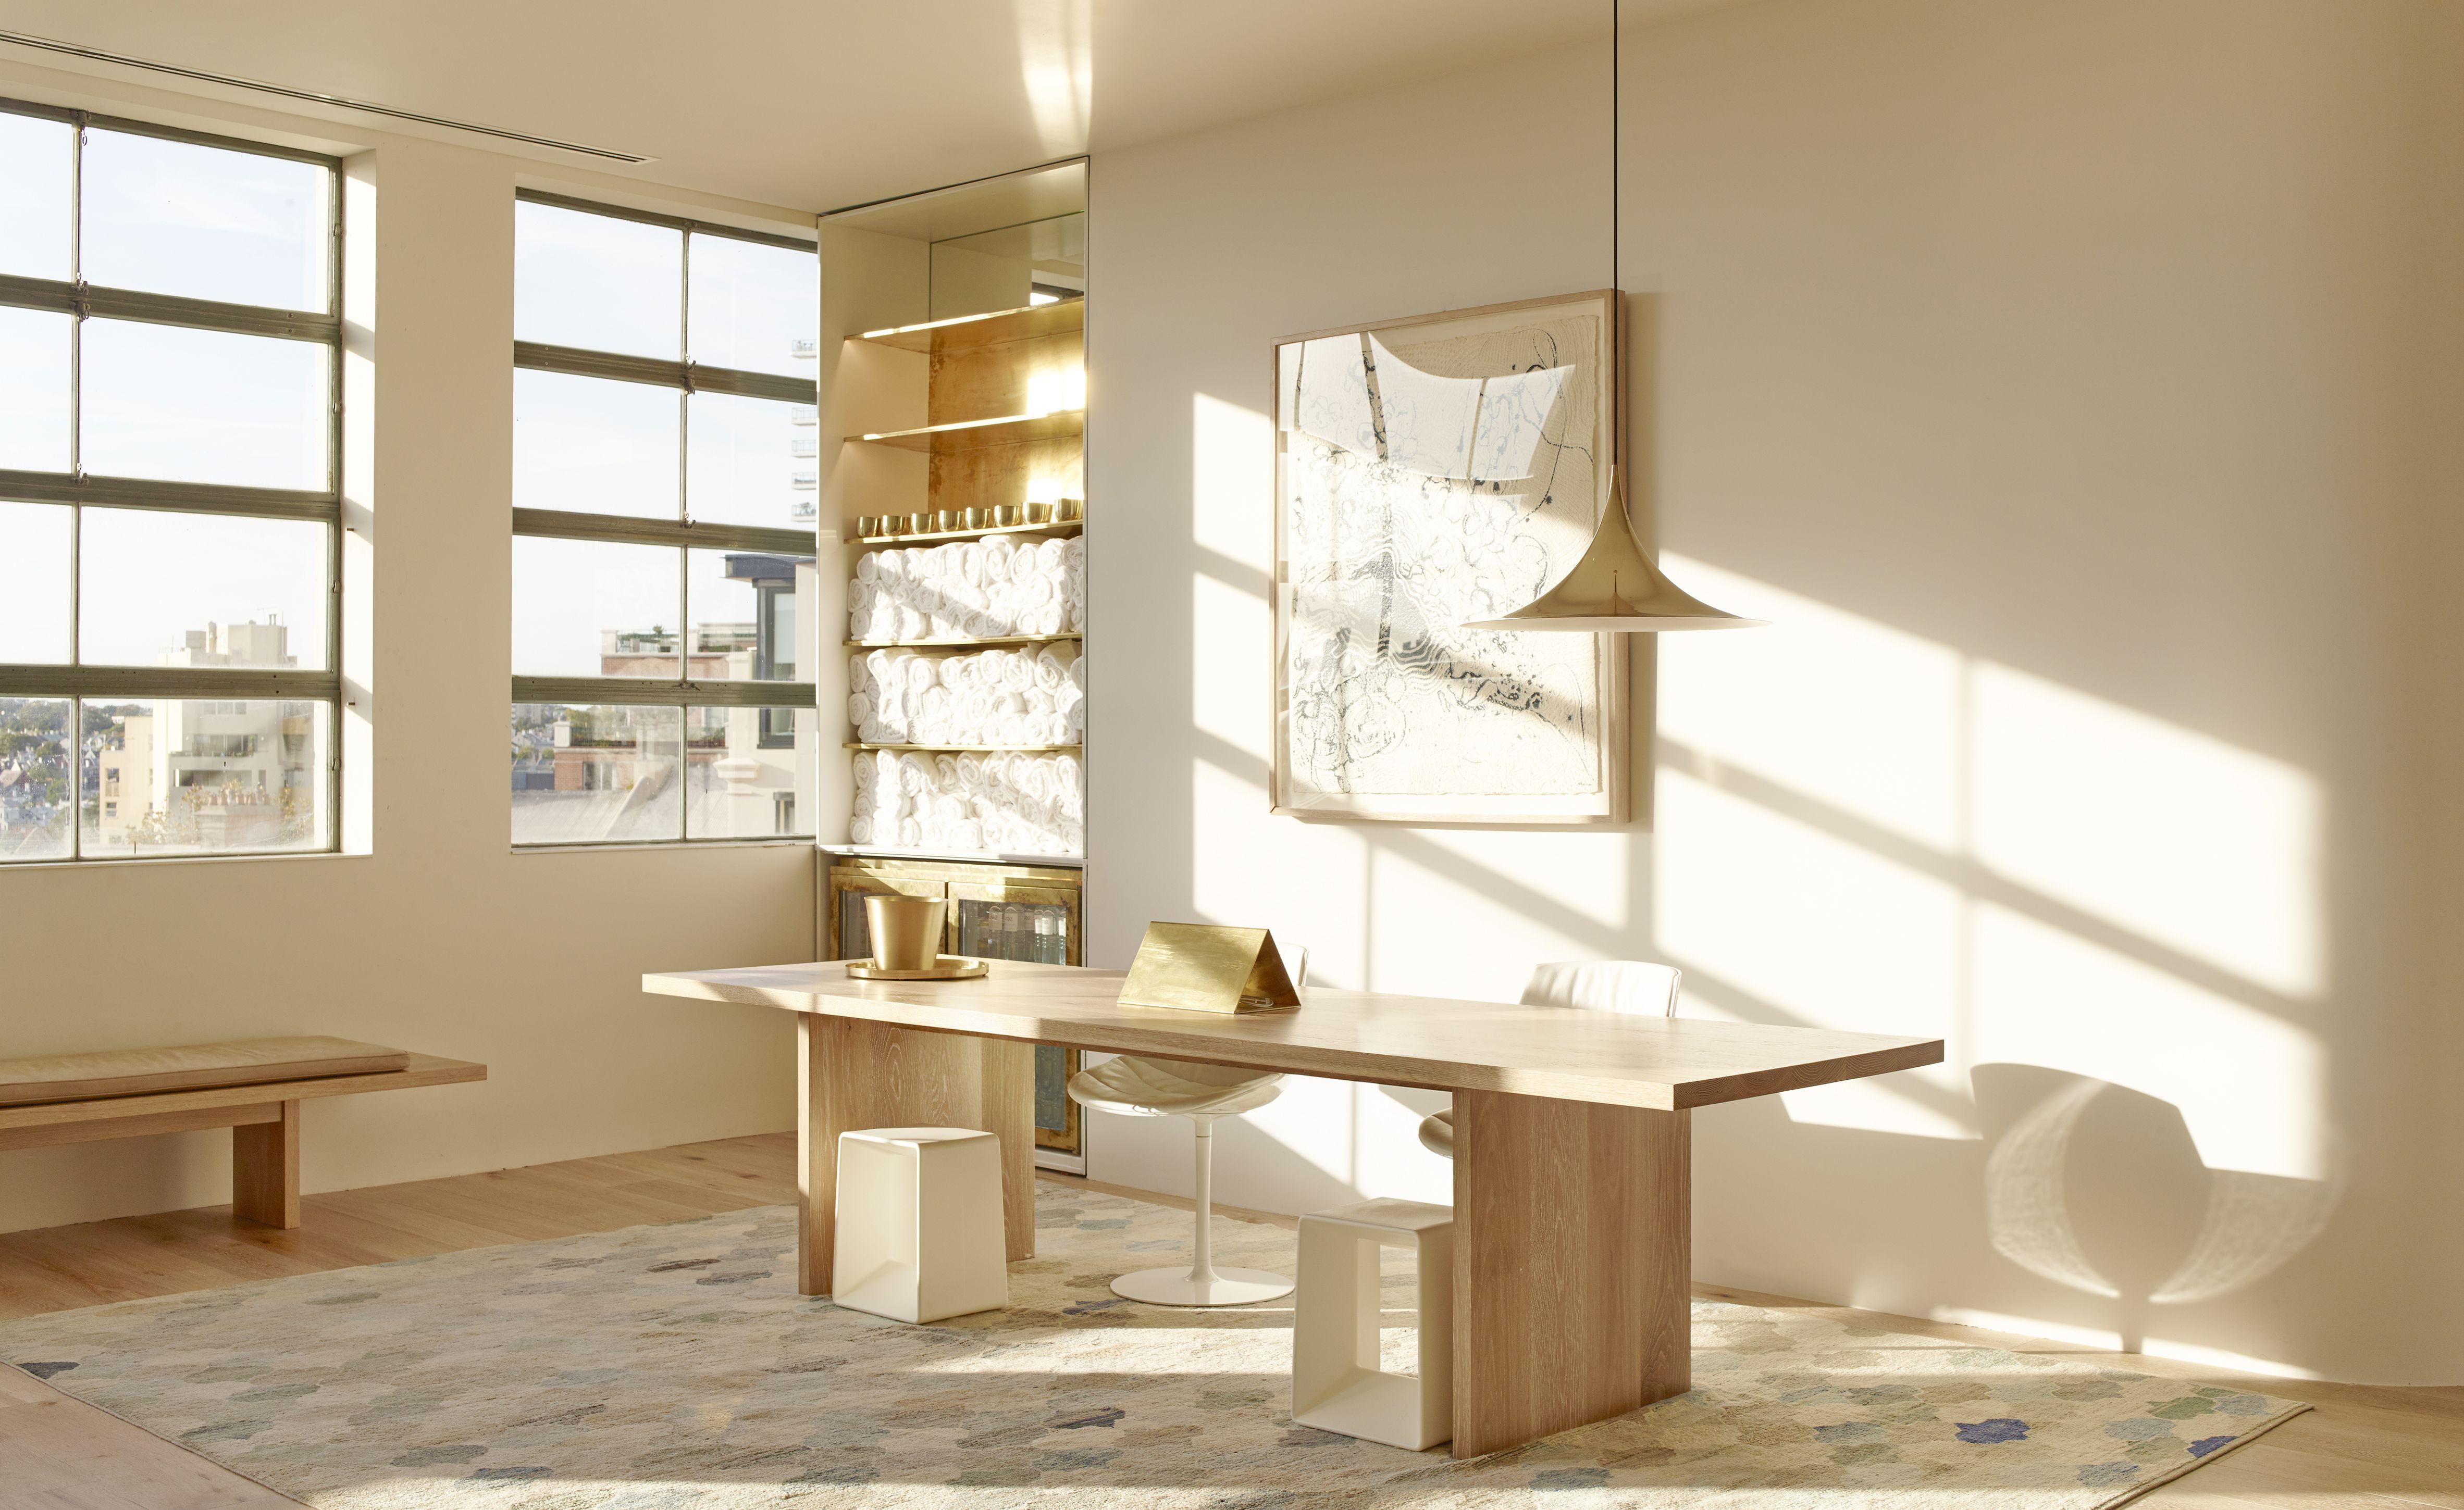 Melbourne Yoga Studio Expands To Sydney  interiors and exteriors